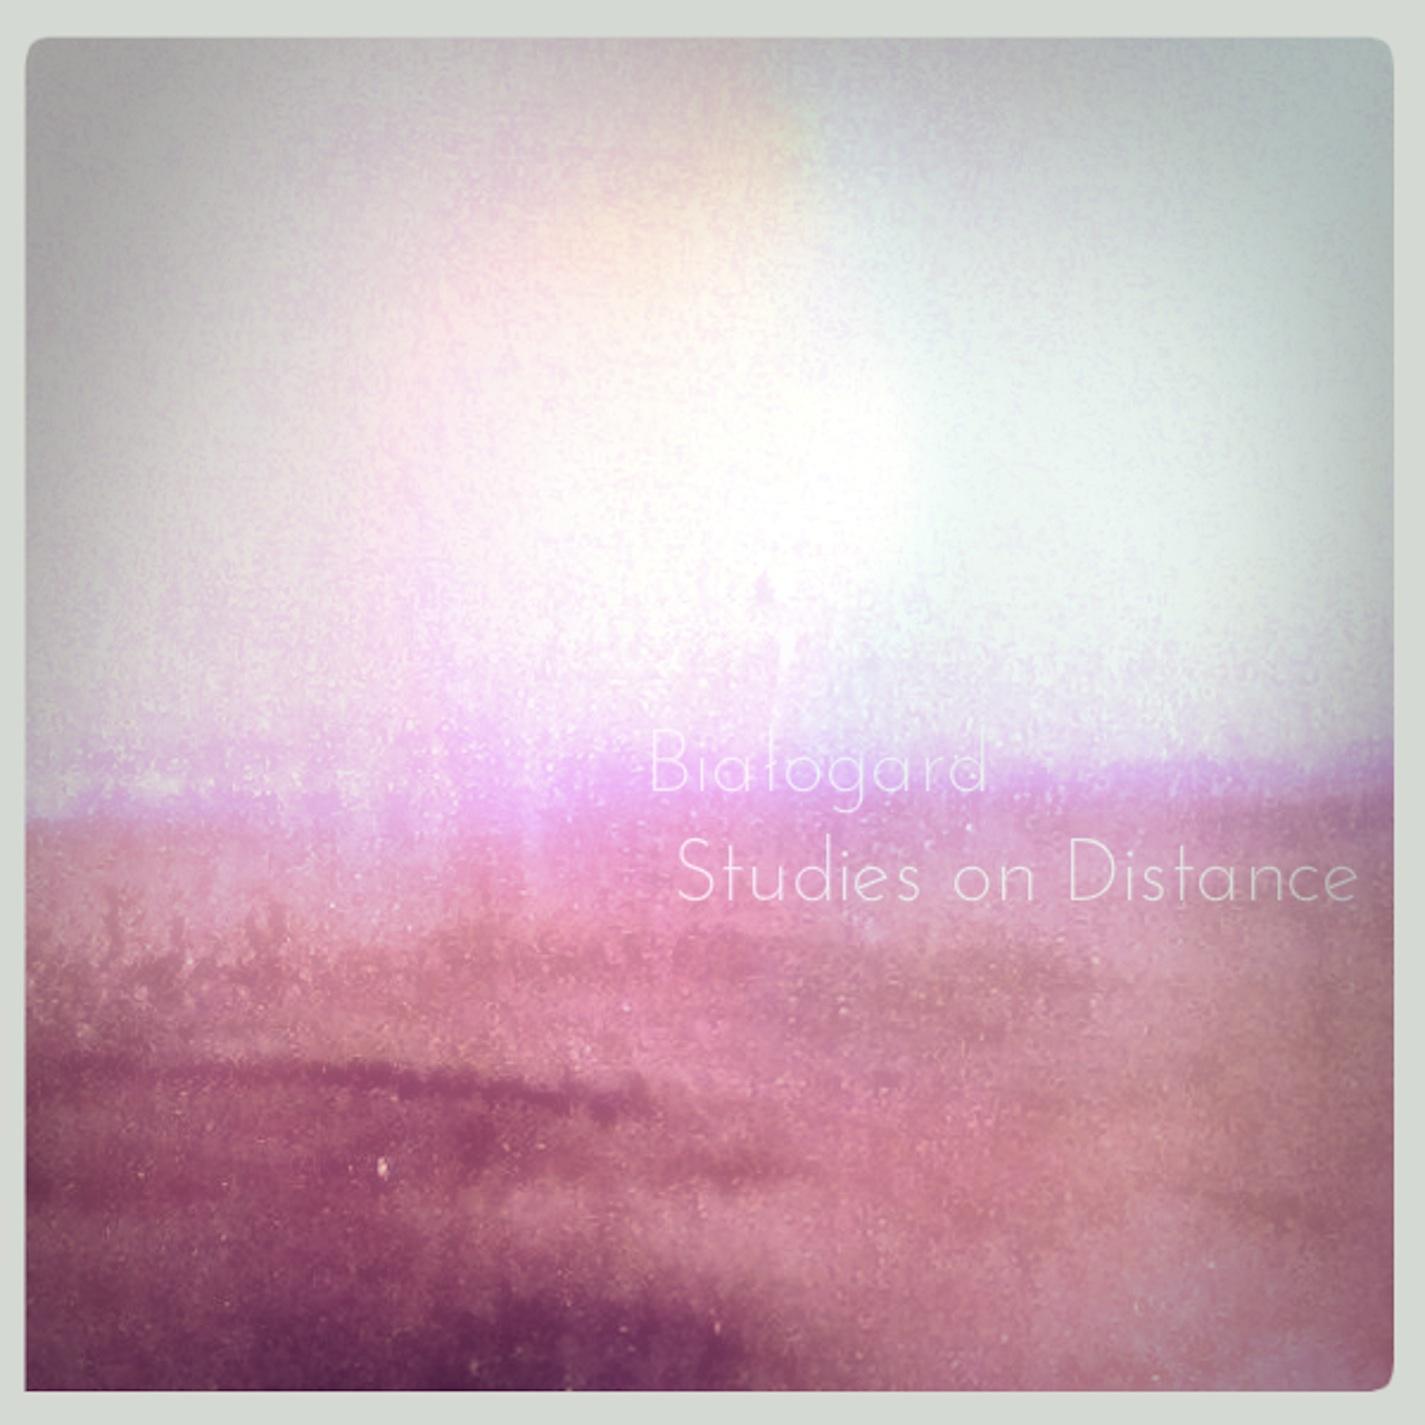 Studies_on_distance_14251367182873